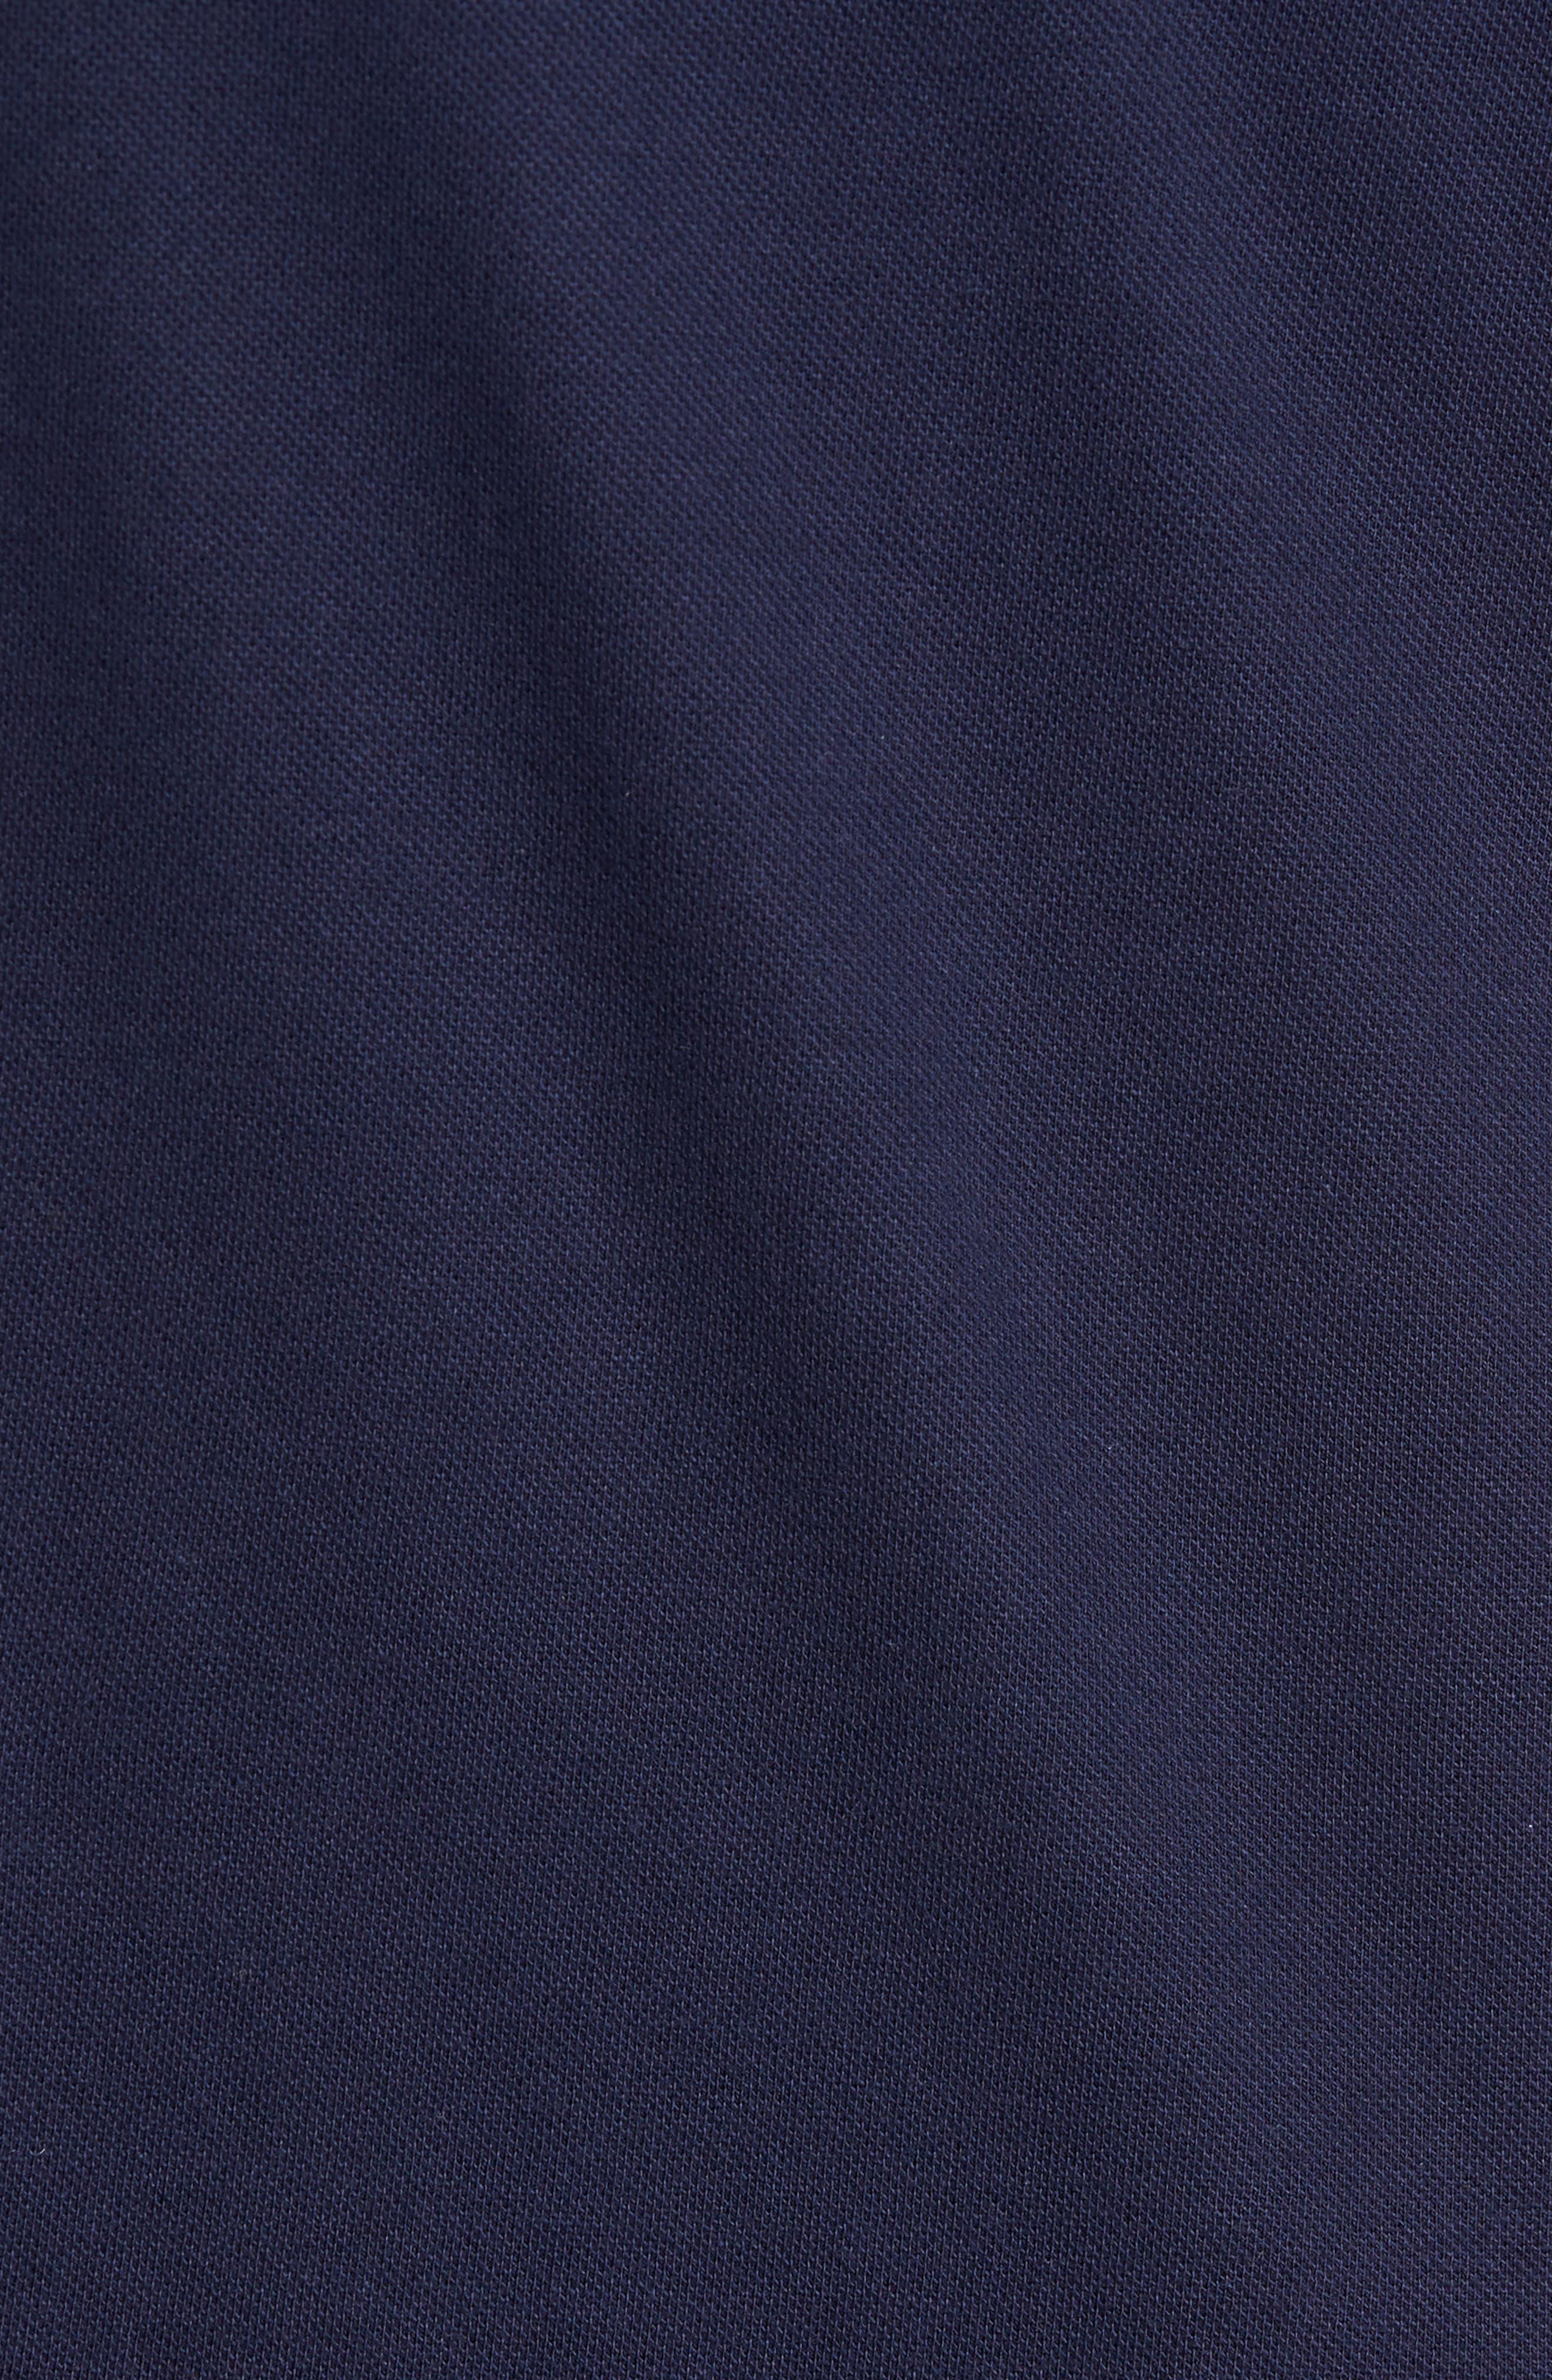 Moretti Short Sleeve Zip Henley Shirt,                             Alternate thumbnail 5, color,                             001